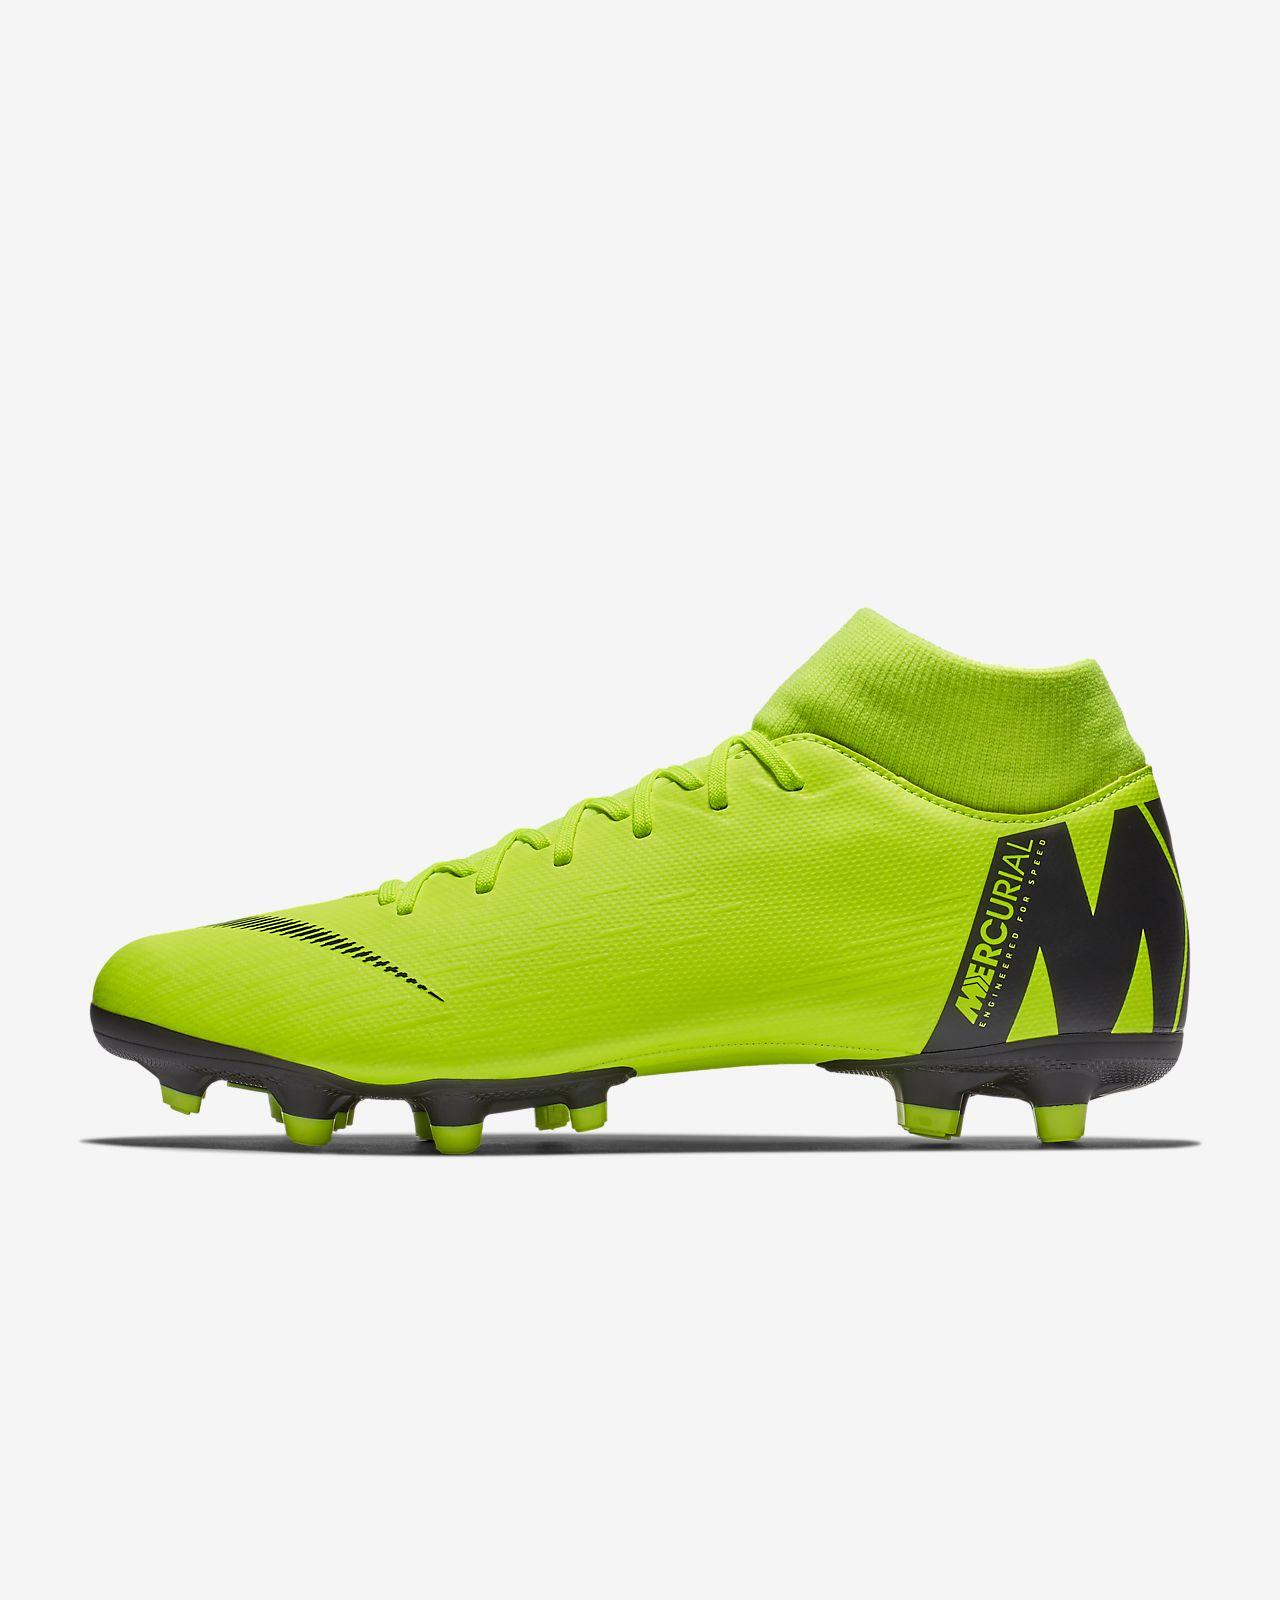 ... Nike Mercurial Superfly 6 Academy MG Botas de fútbol para múltiples  superficies caf7df05f0d32